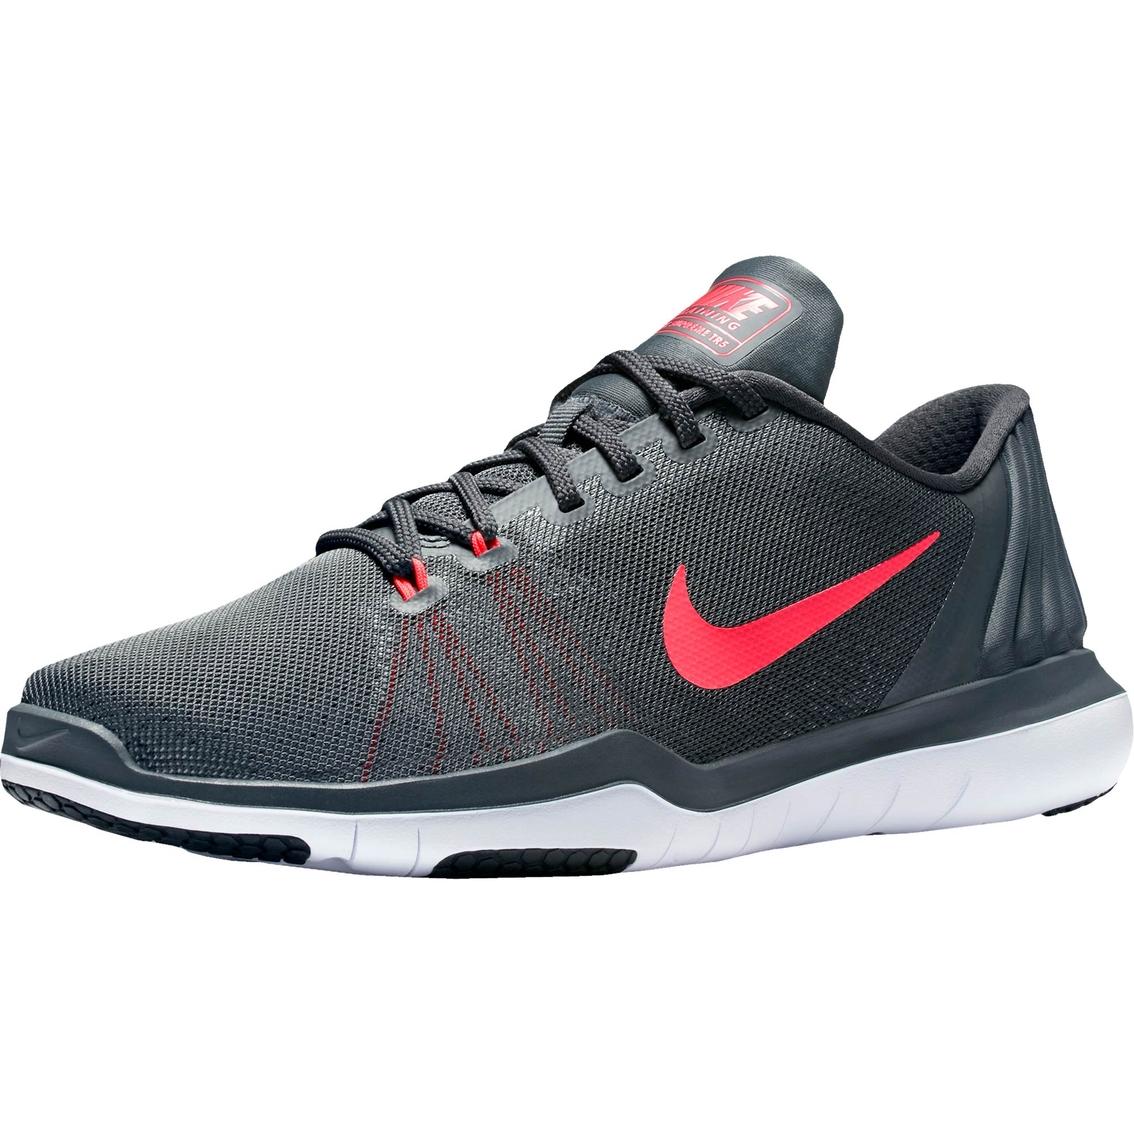 618d7ffb1a20 Nike Women s Flexsupreme Tr5 Training Shoes